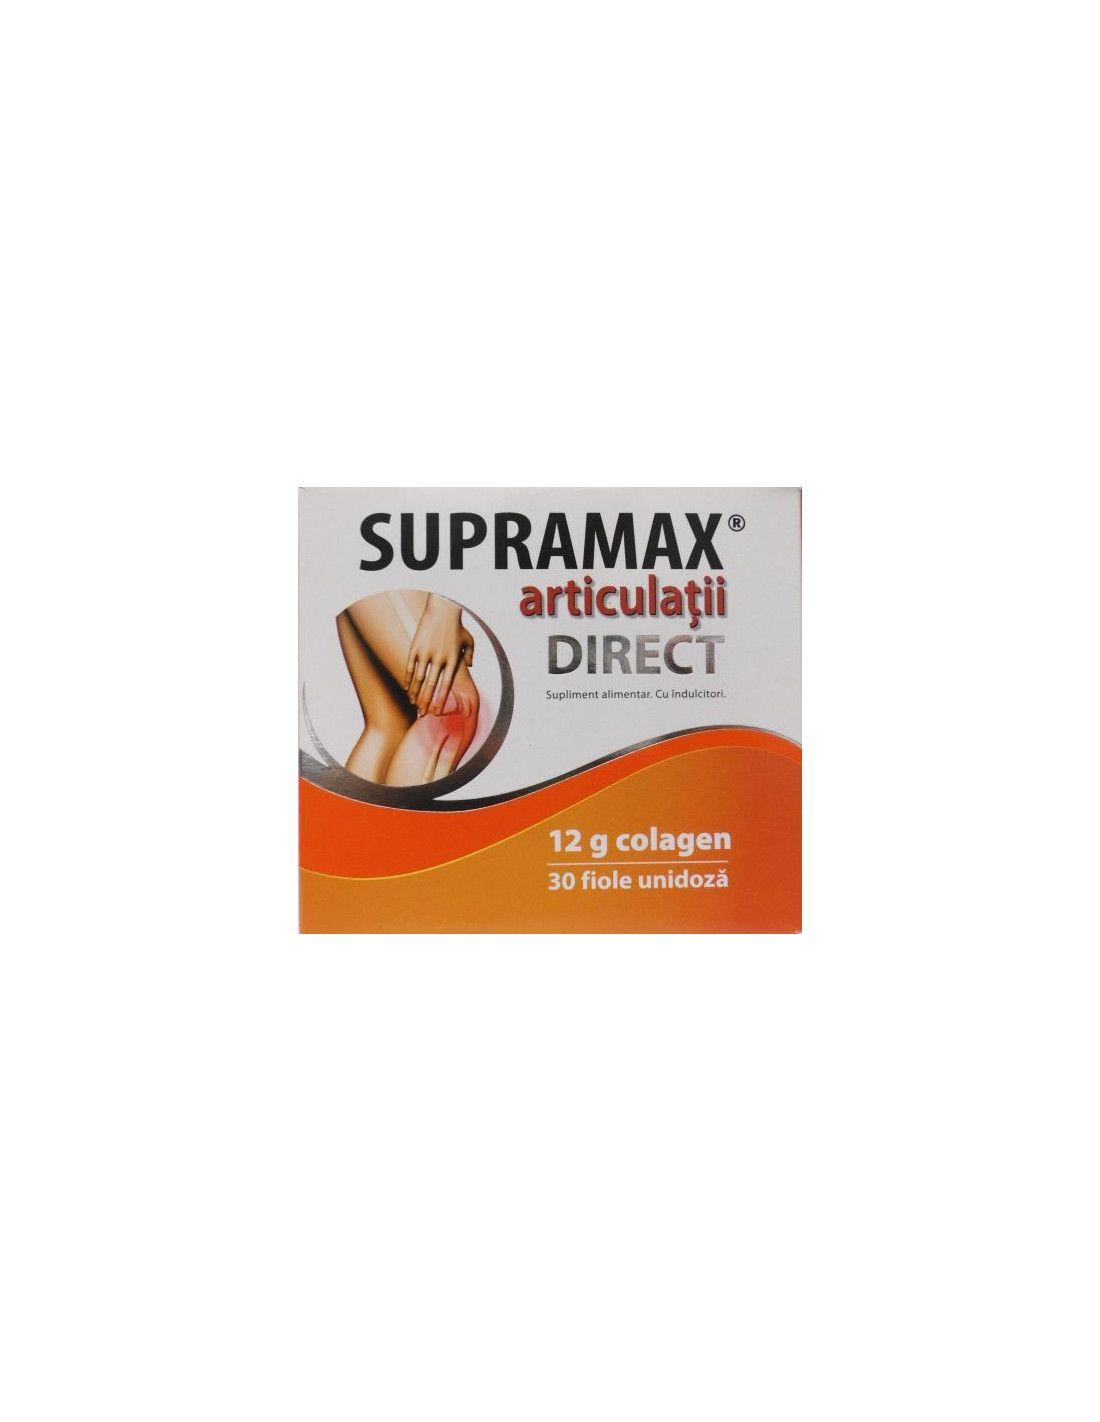 Zdrovit Supramax Articulatii Direct 12 g colagen, 10 fiole